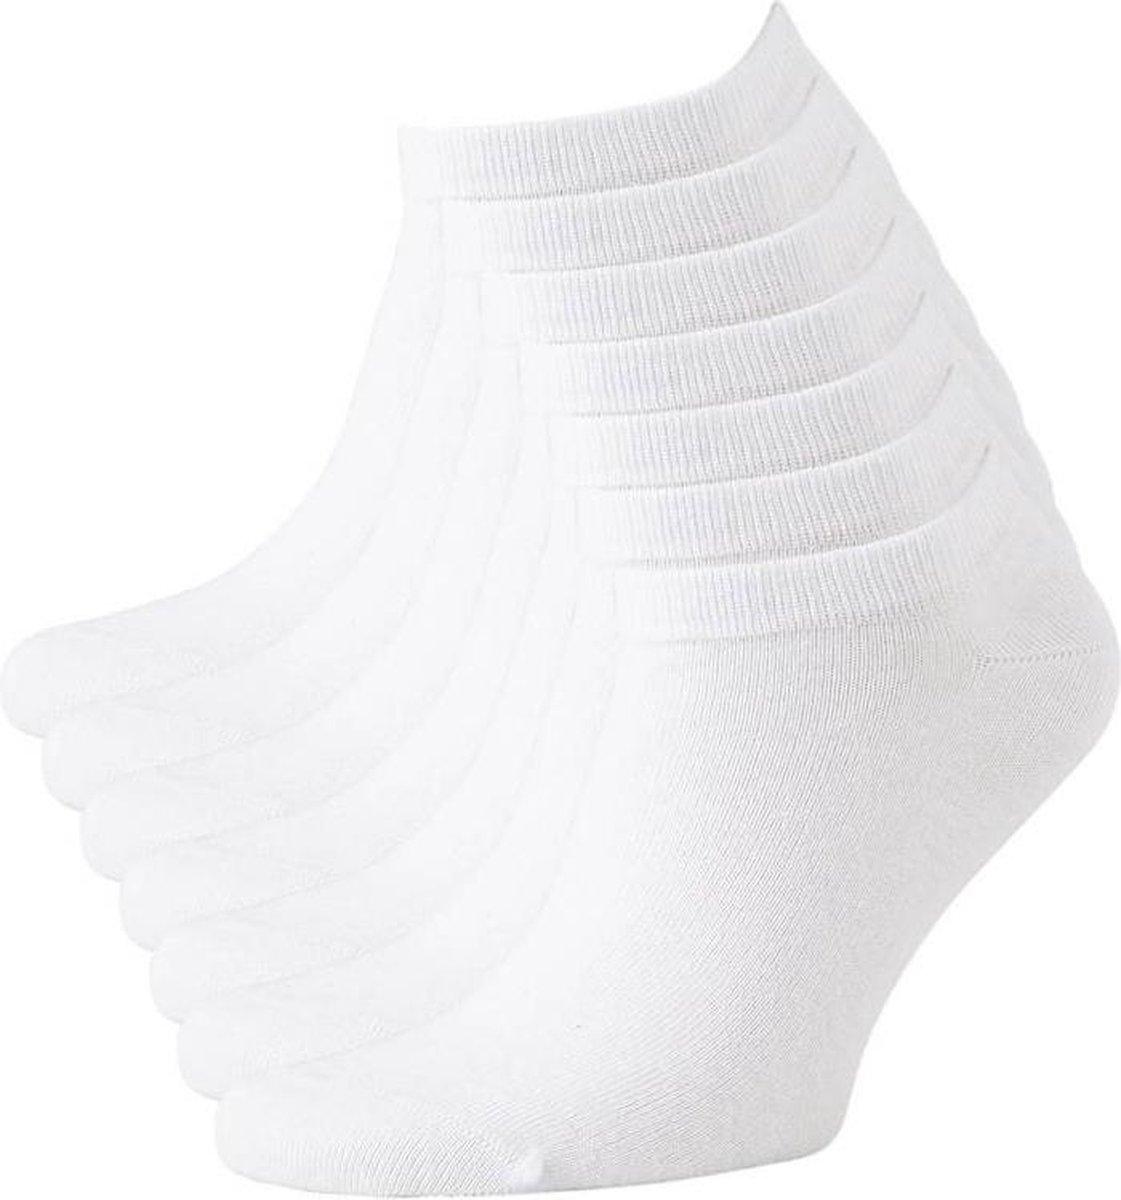 Sneaker Sokken - Enkel Sokjes - Wit - Maat 43-46 - 6 Pack